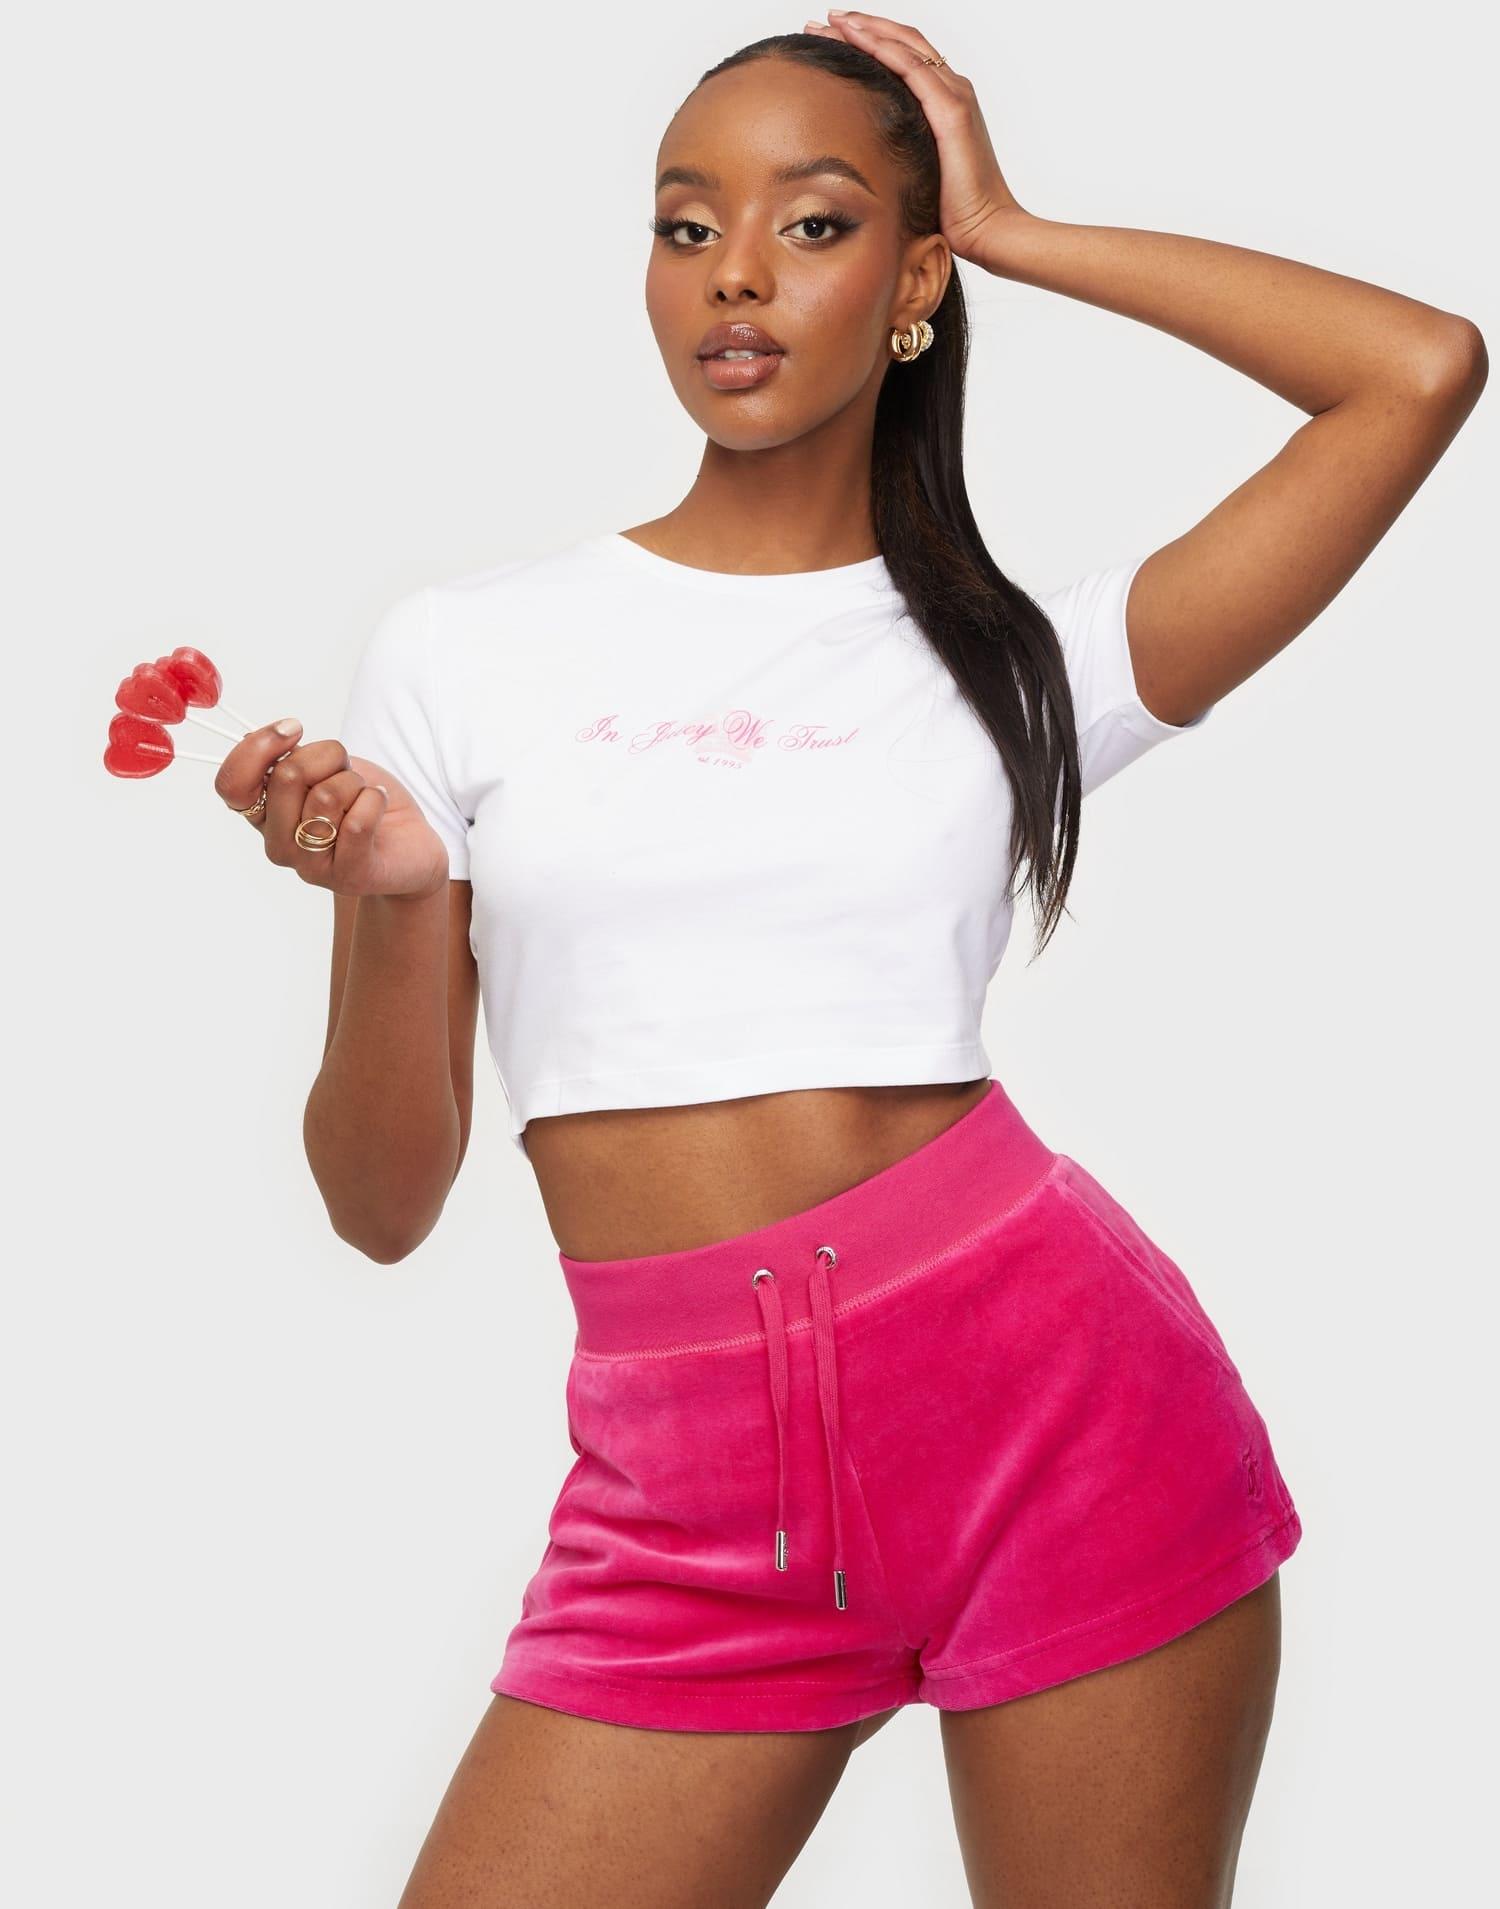 Rosa shorts från Juicy Couture 2021